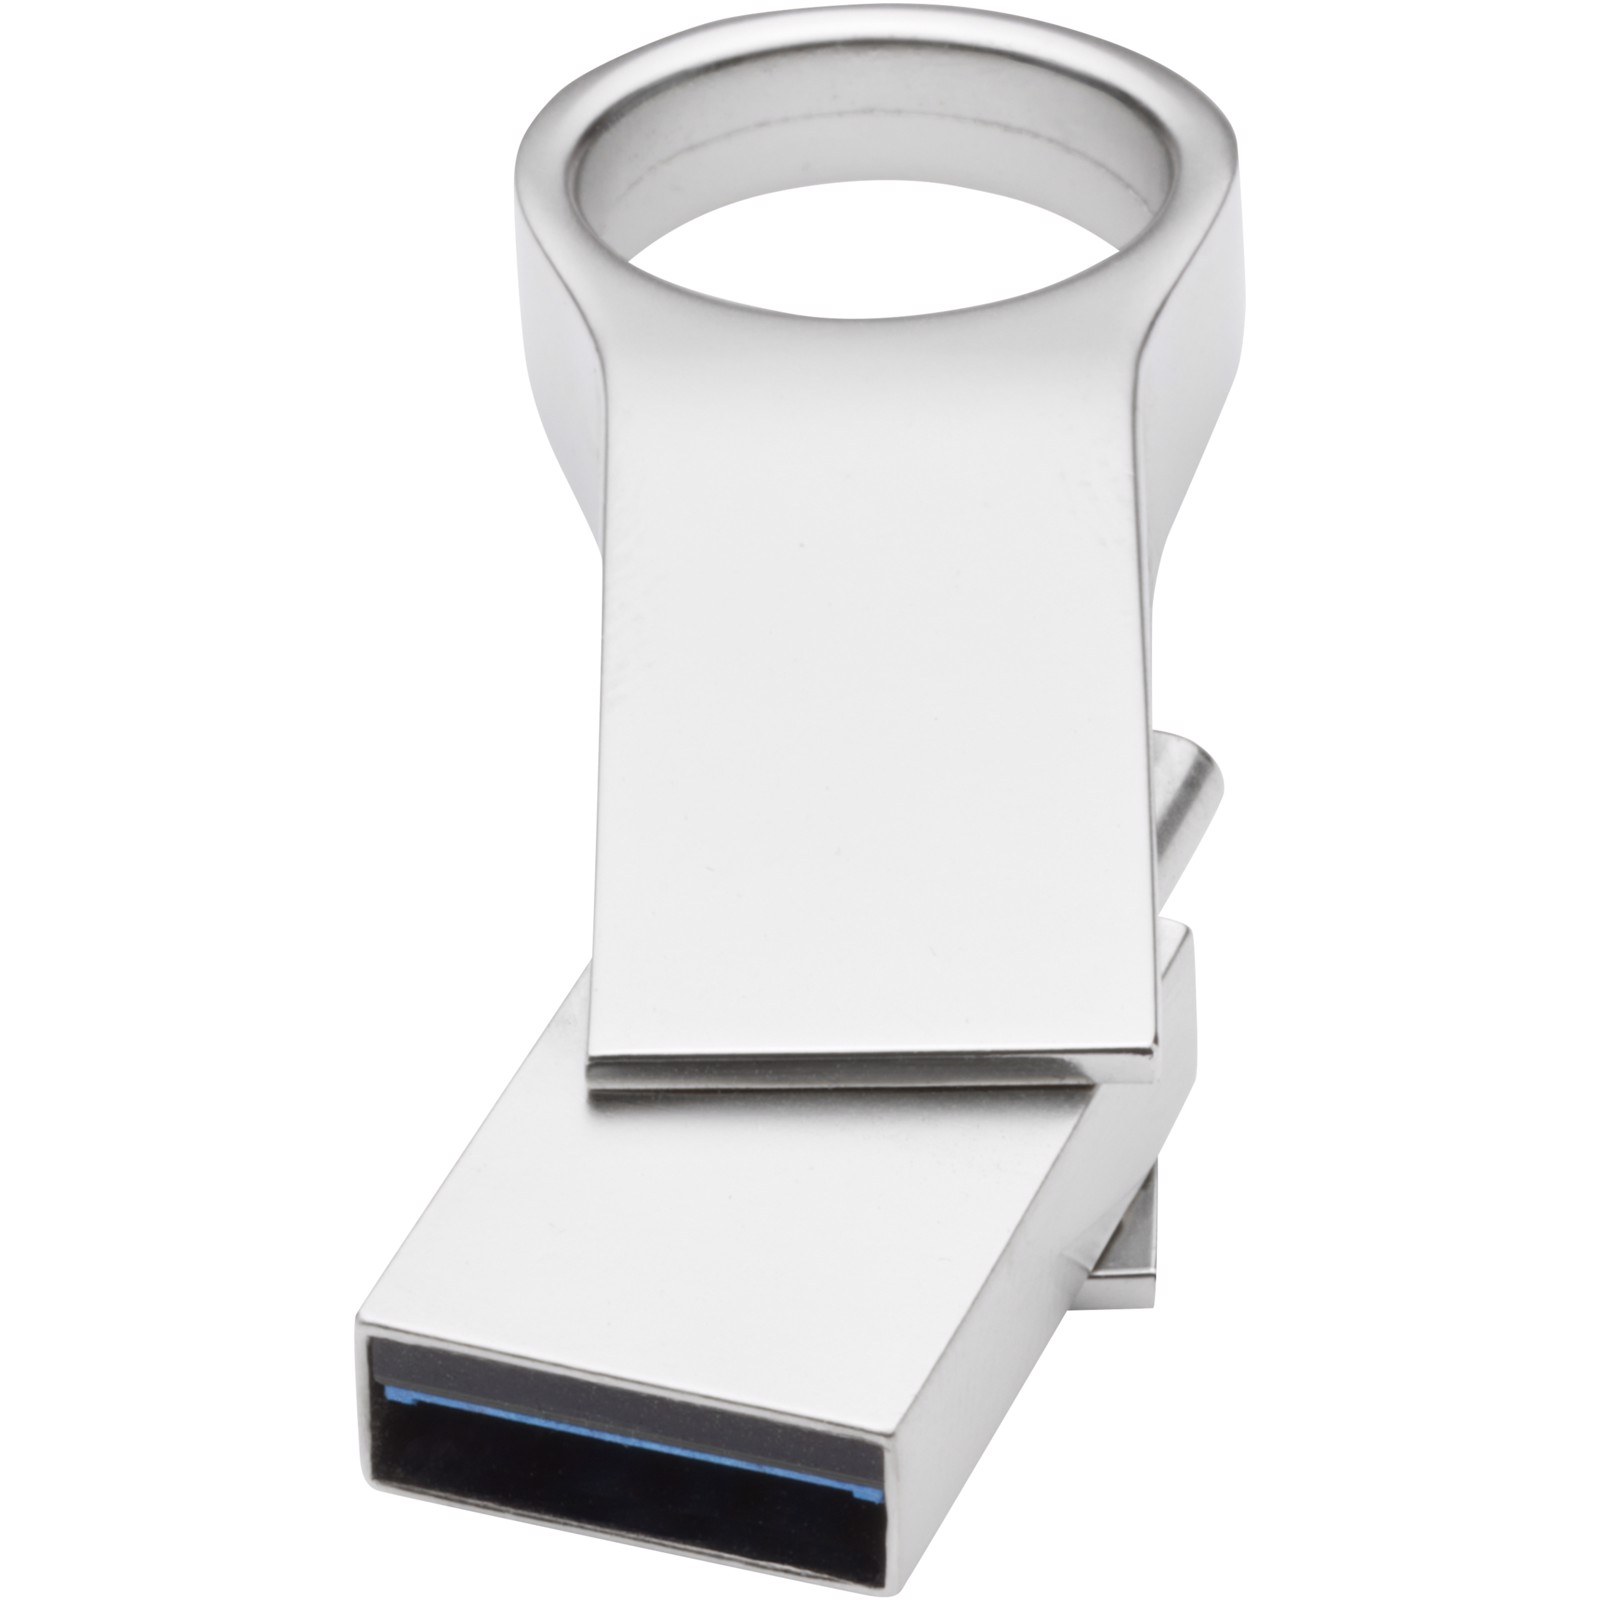 Type C USB 3.0 round large - Silver / 32GB